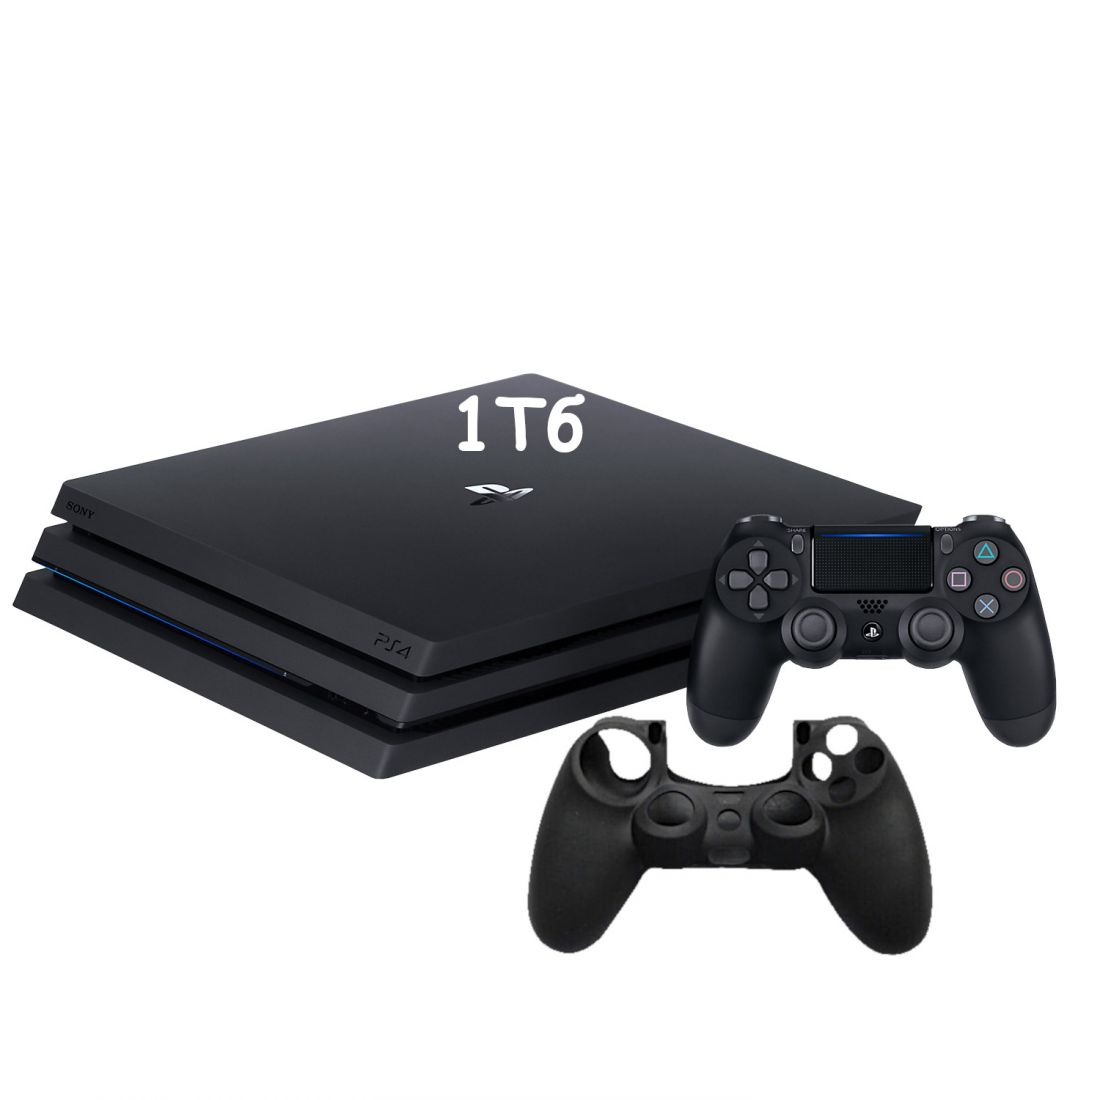 Sony PlayStation 4 Pro 1Tb ( CUH-7208B ) + Силиконовый чехол для джойстика